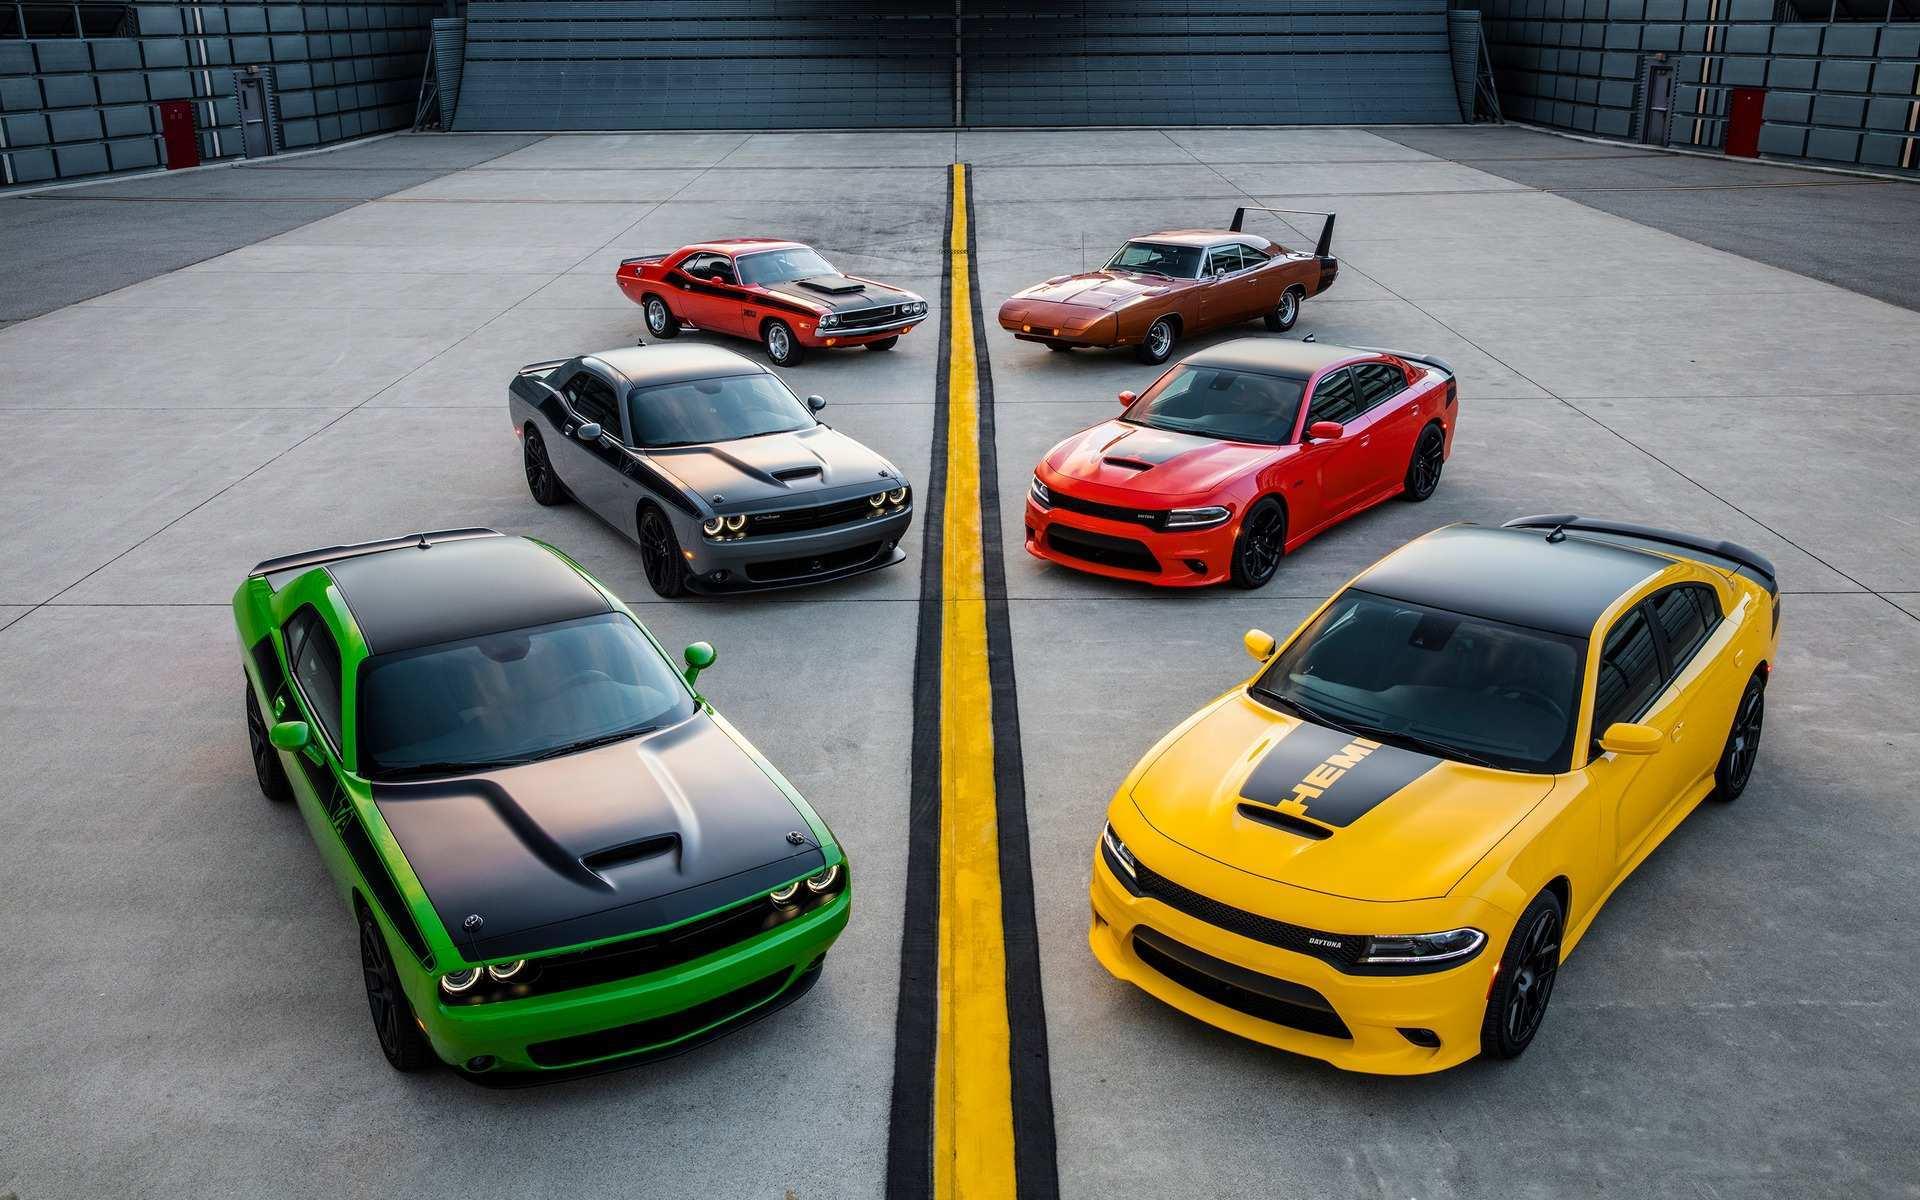 68 Great Dodge Models 2020 Overview by Dodge Models 2020